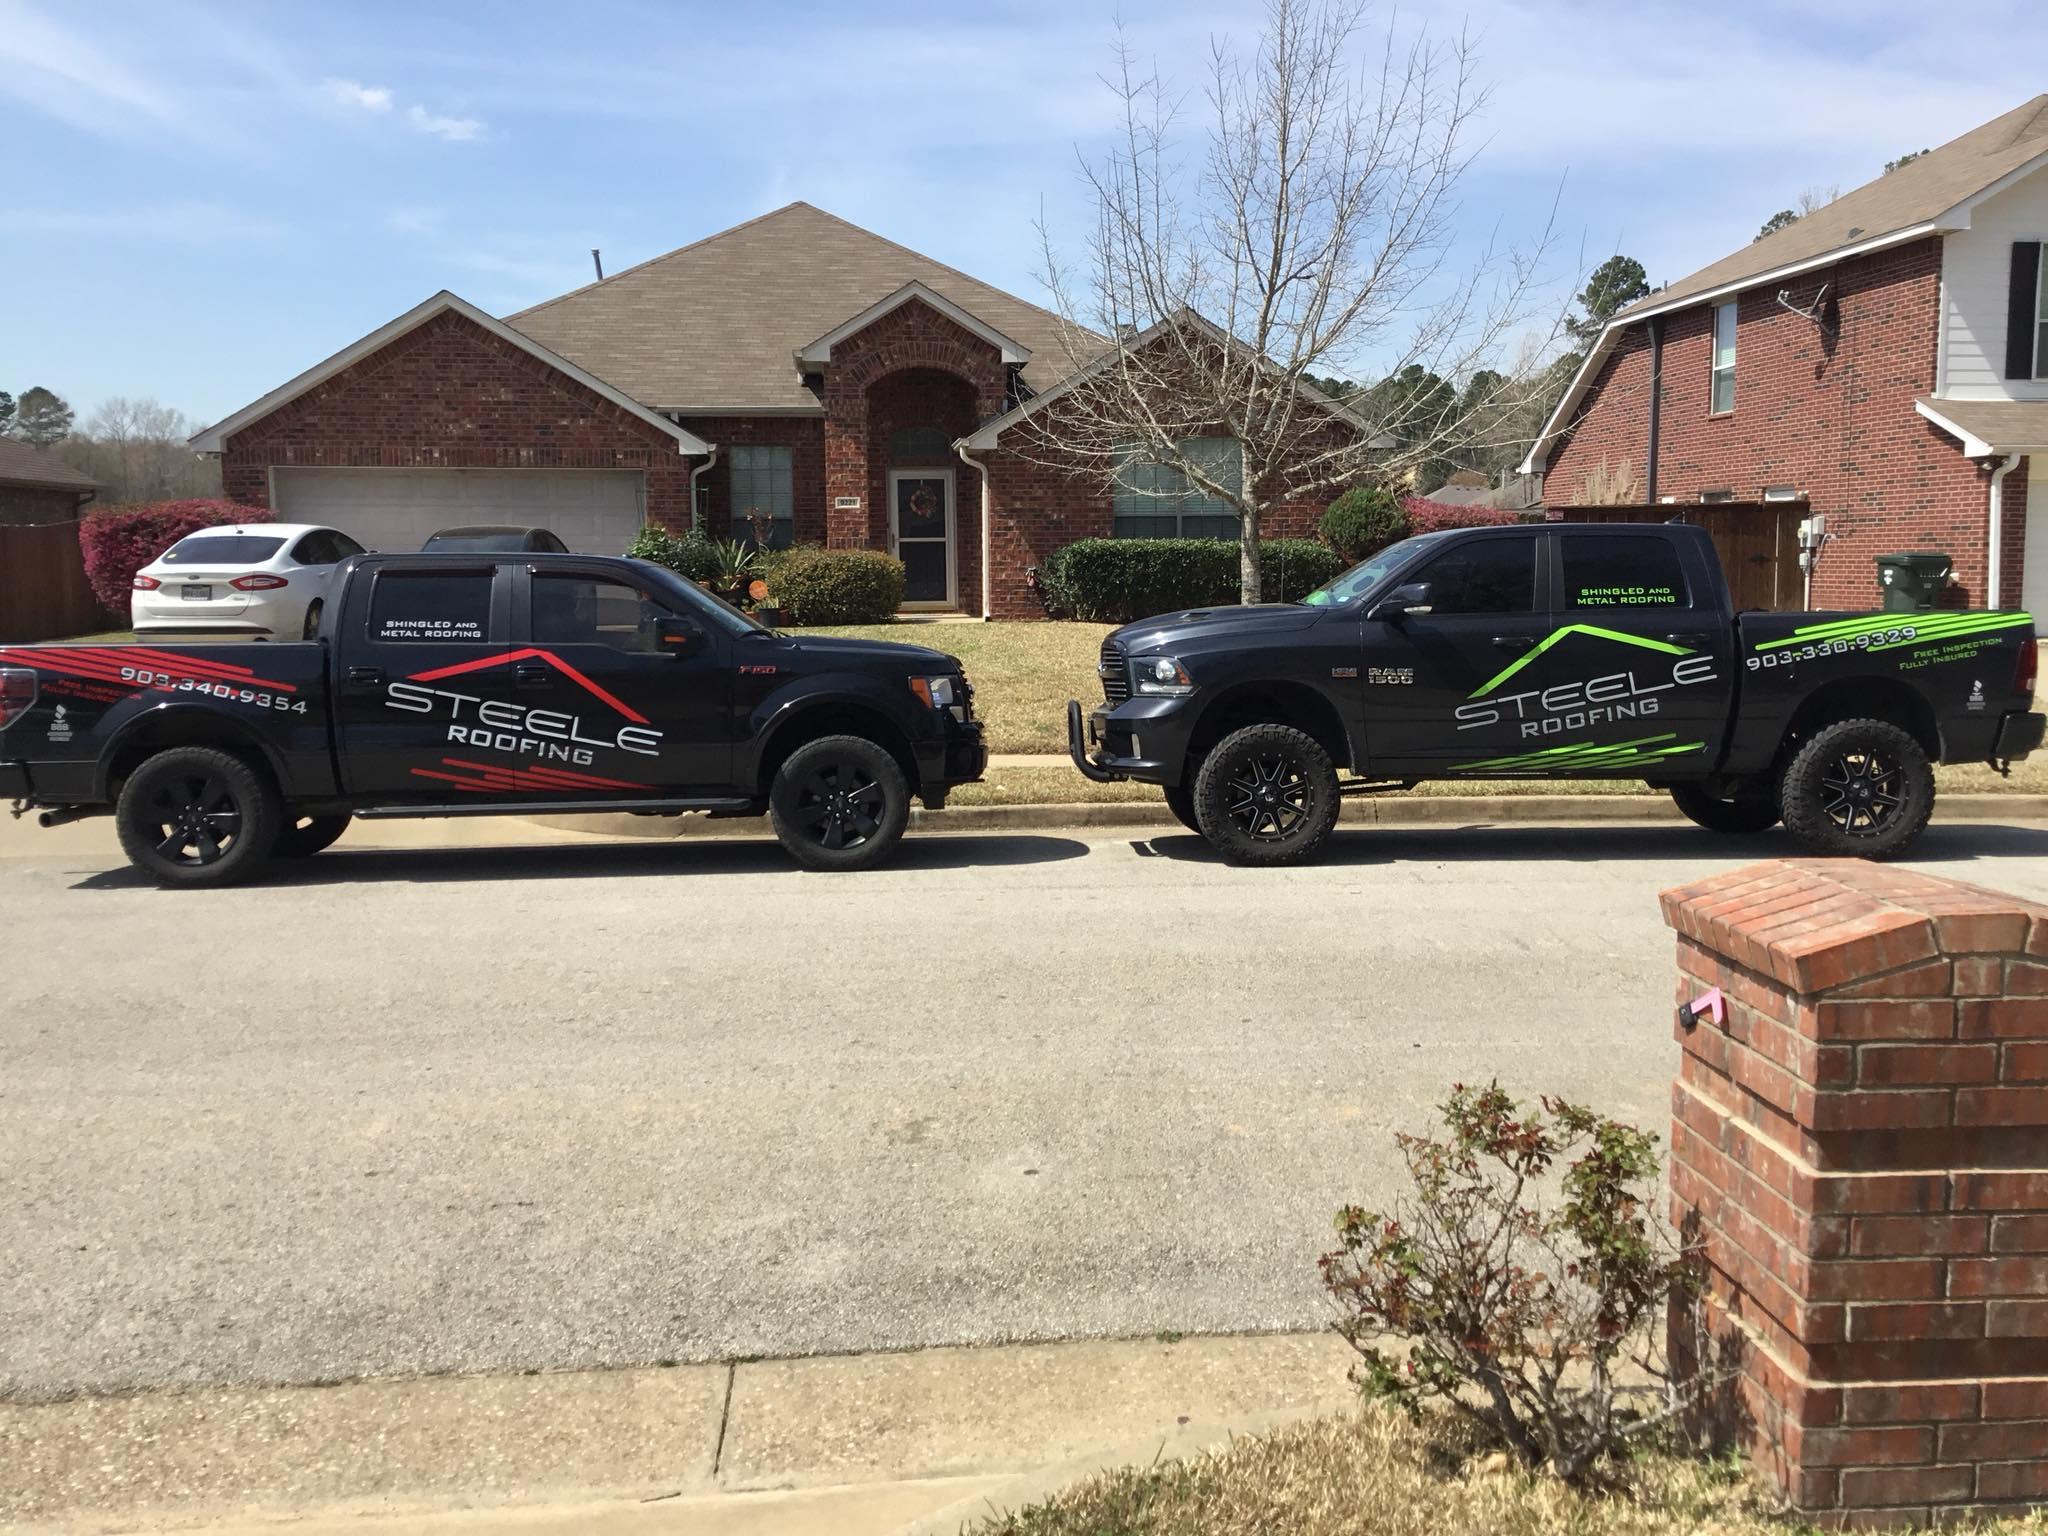 Two steeleroofing trucks